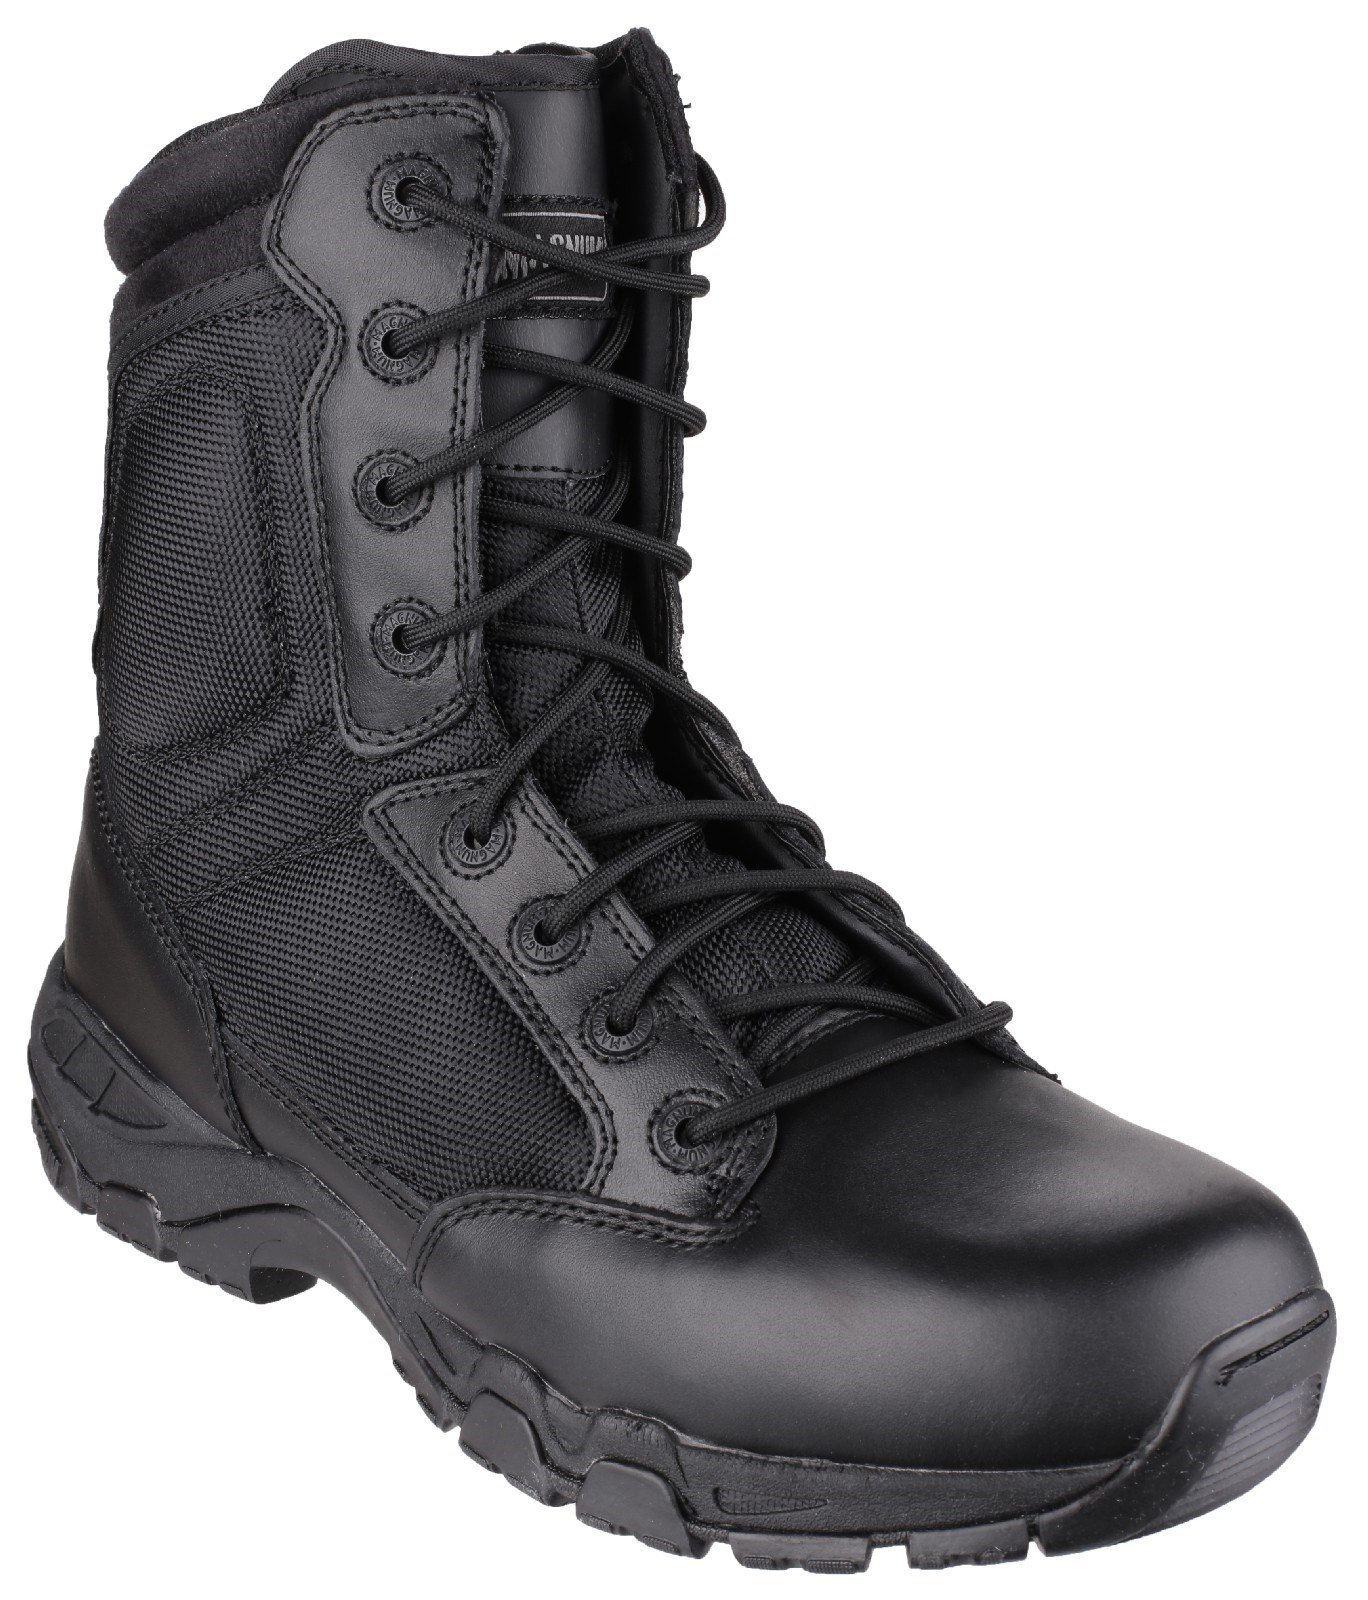 Magnum Unisex Viper Pro 8.0 Sz EN Lace Up Safety Boot Black 22414 - Black 3